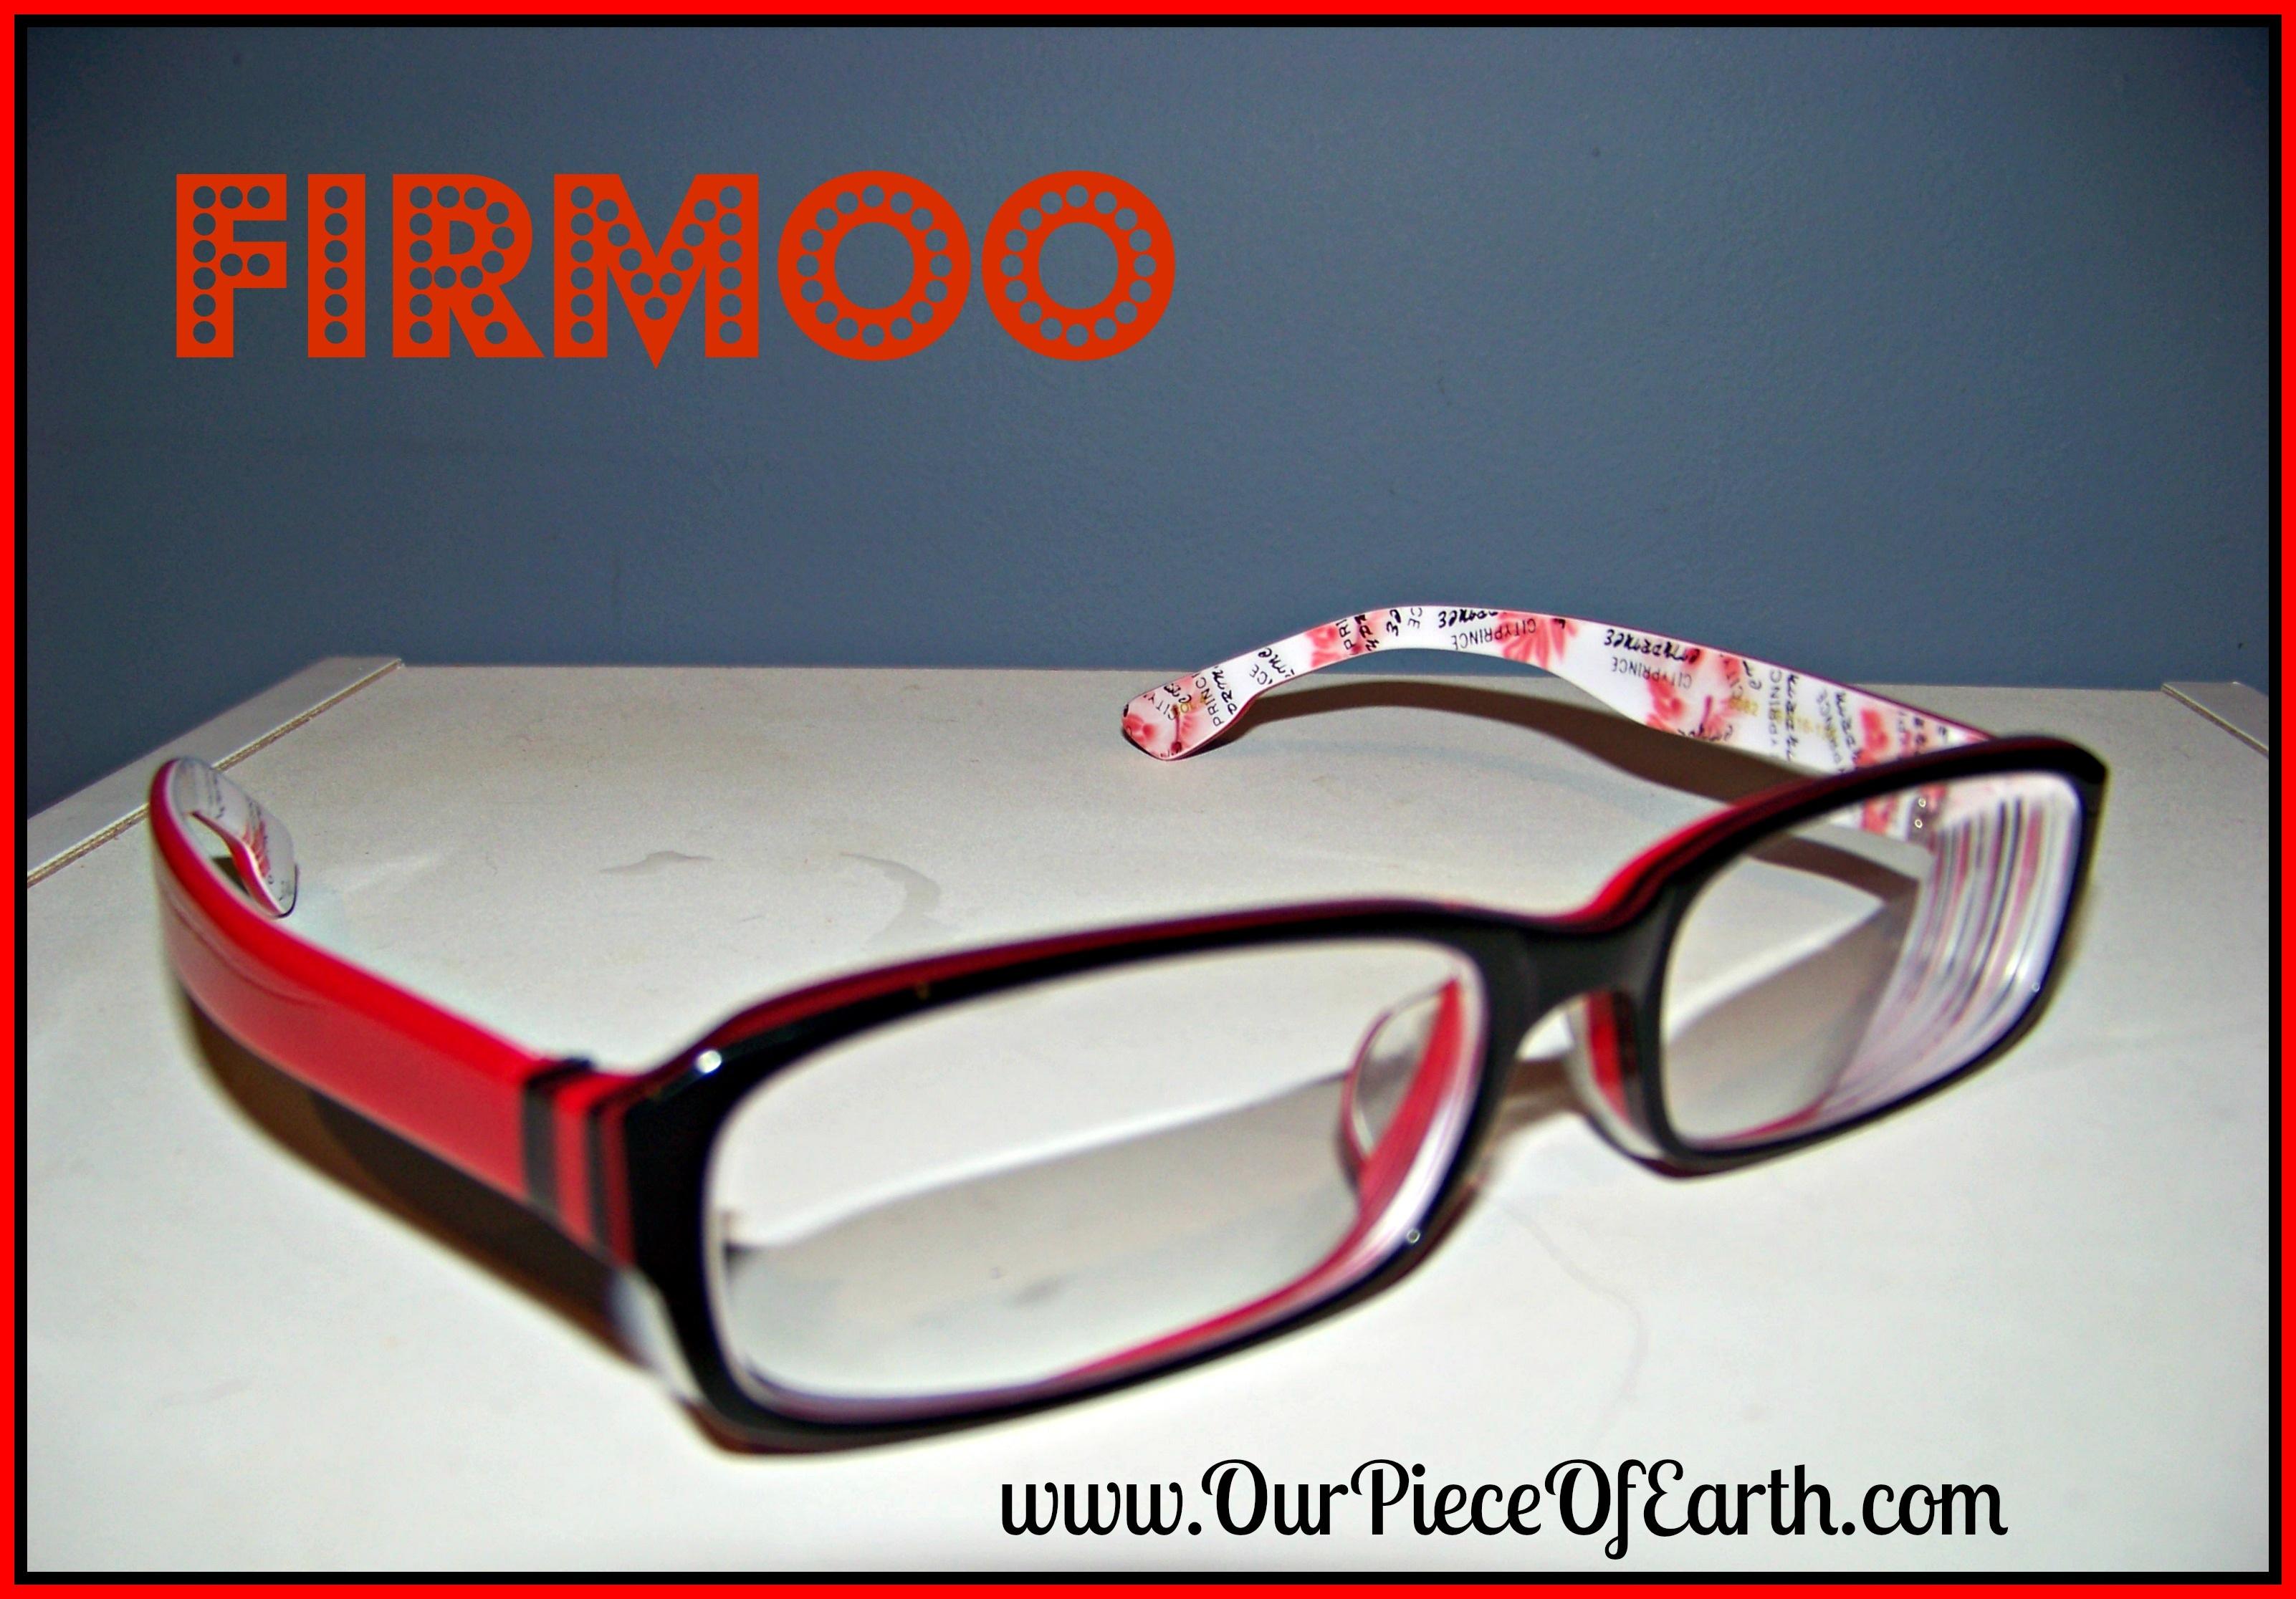 Firmoo, eyeglasses